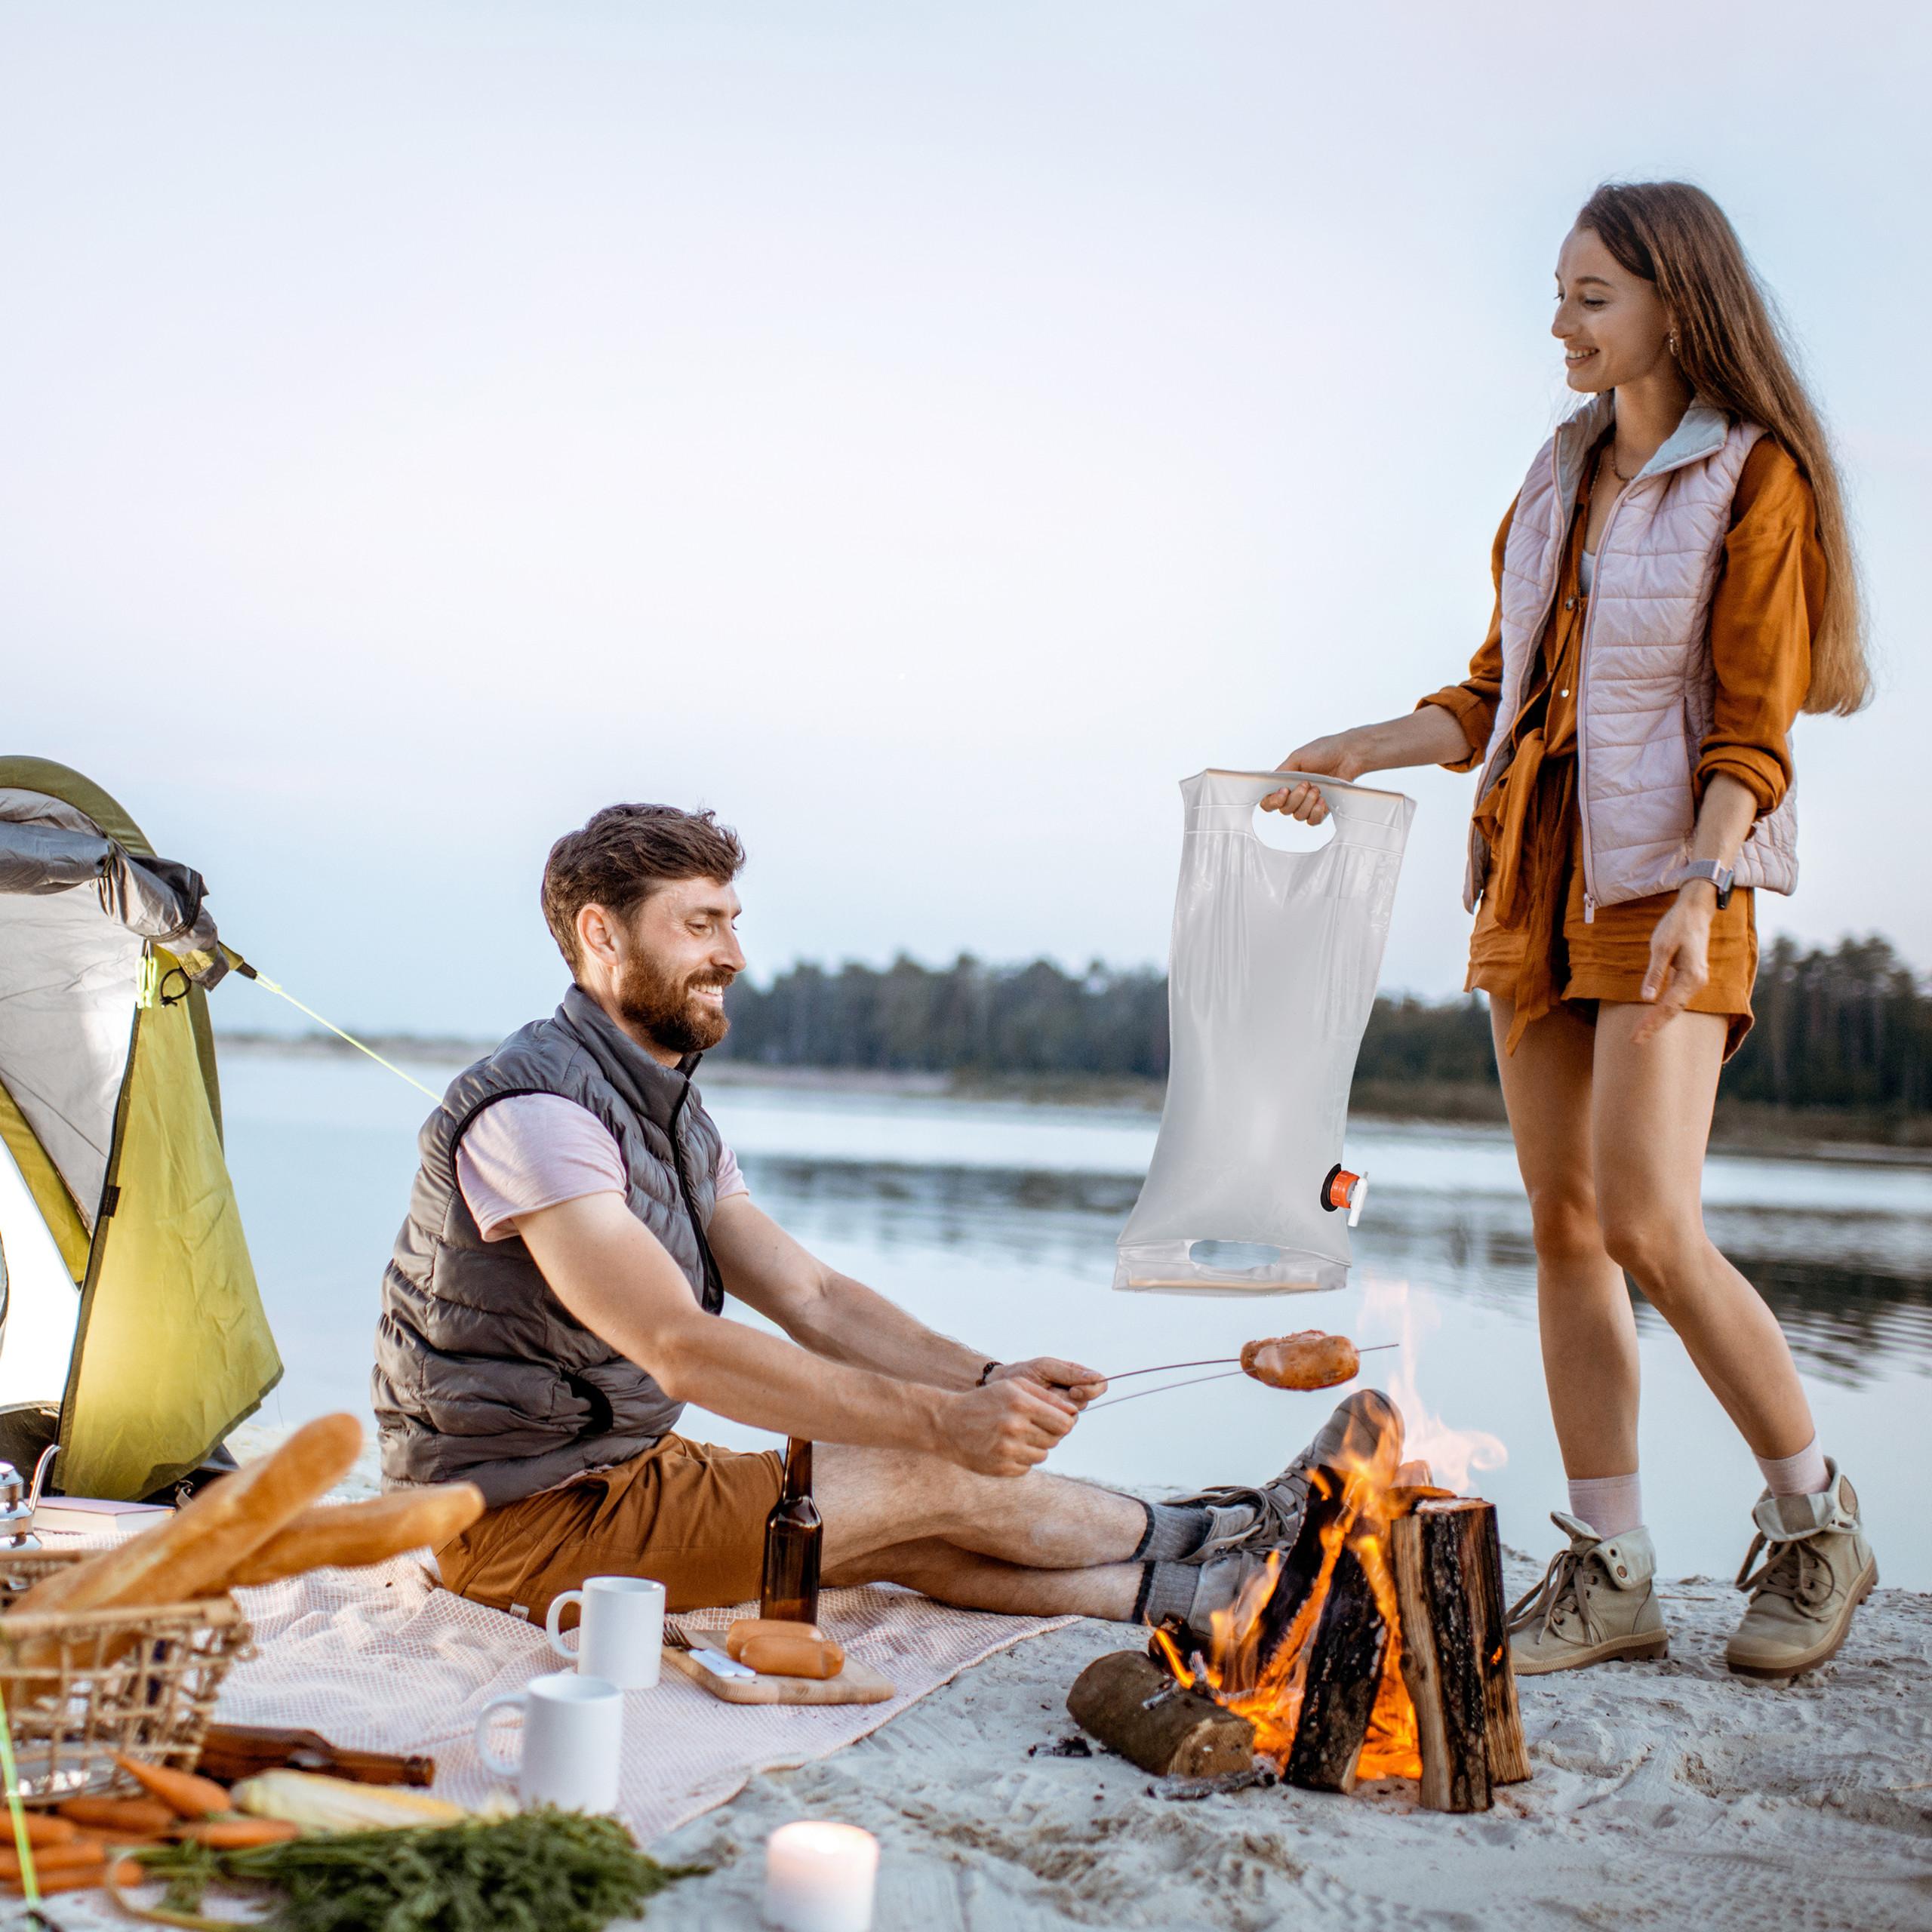 Camping lebensmittelecht Relaxdays Faltkanister 10 Liter transparent PVC Wasserkanister faltbar Kanister mit Hahn